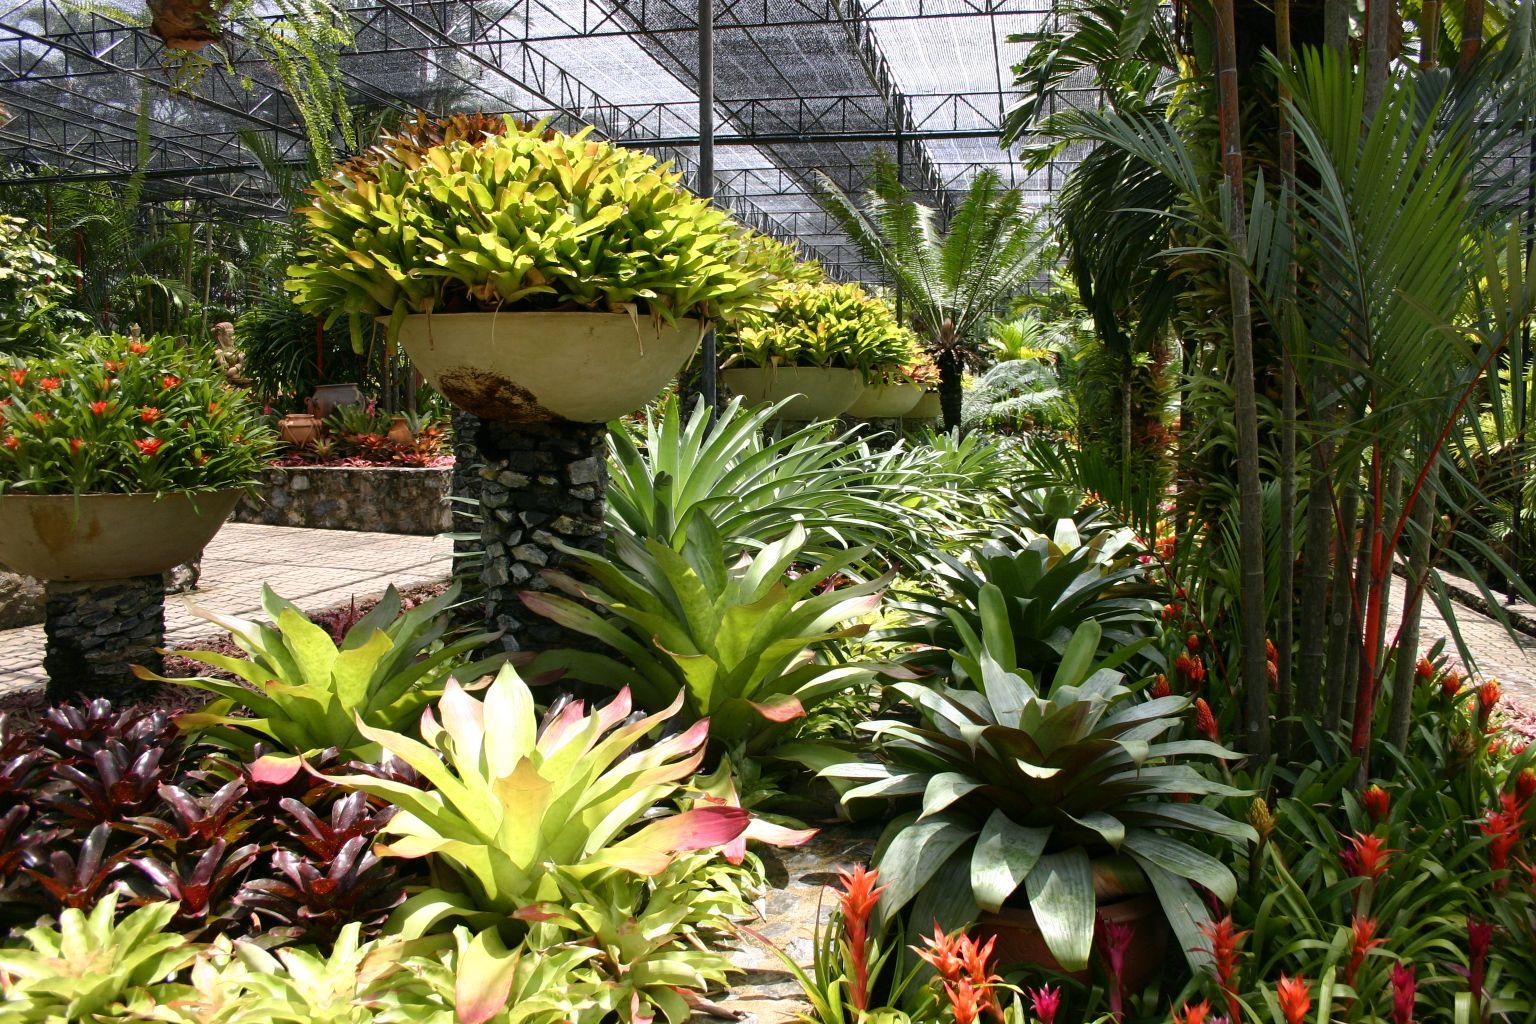 Bromeliad display at Nong Nooch Gardens in Thailand